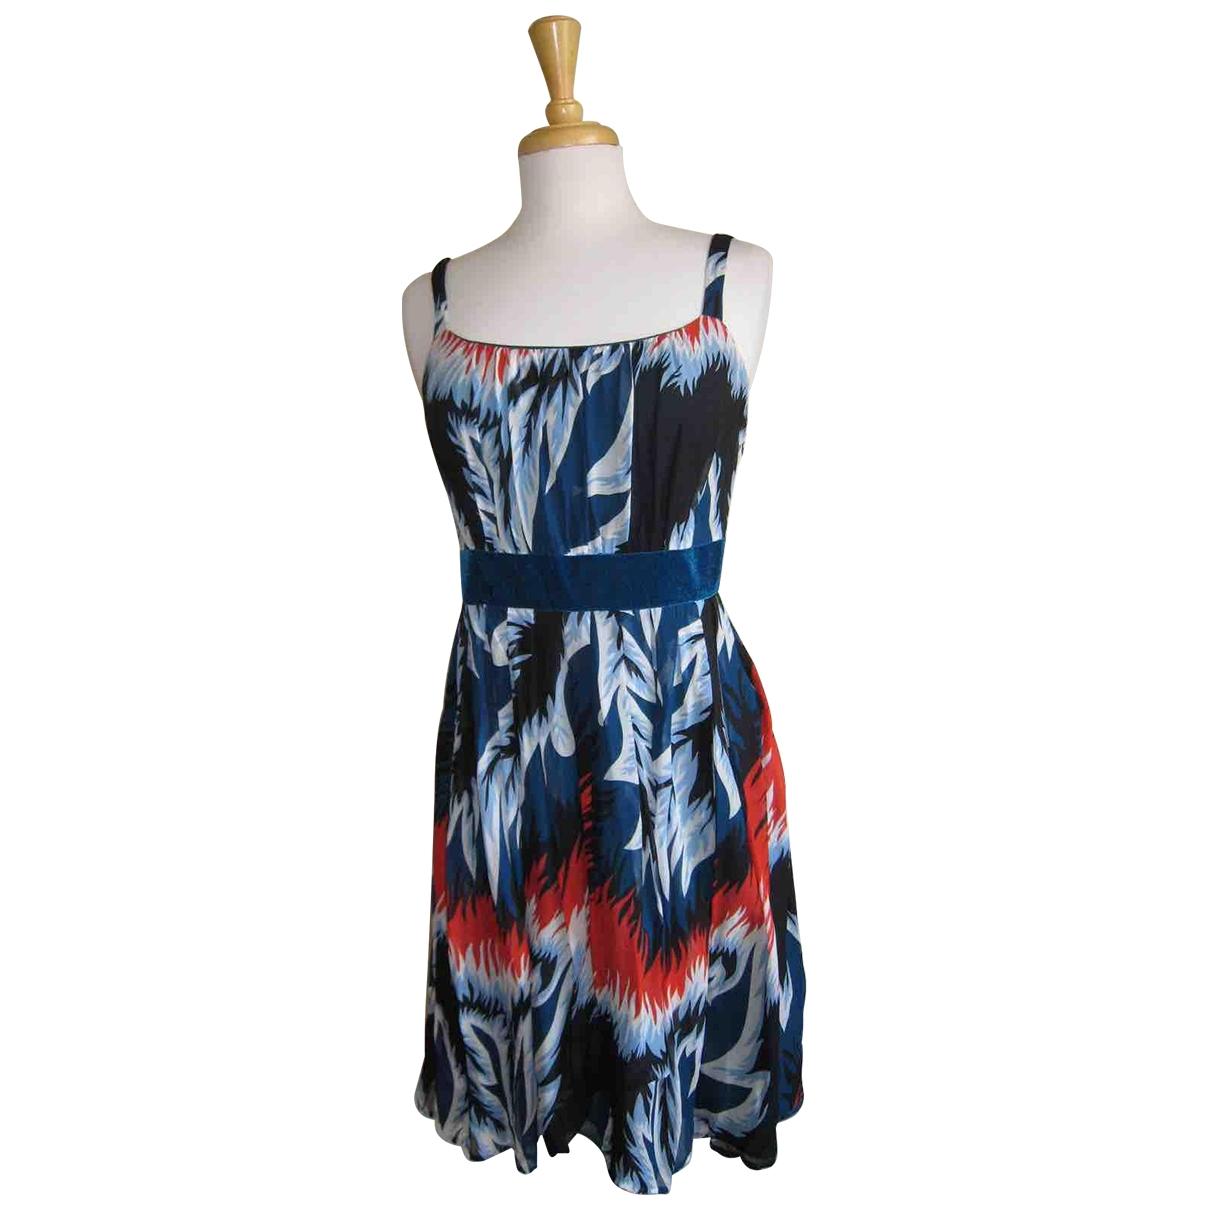 Eley Kishimoto \N Multicolour Silk dress for Women 6 US